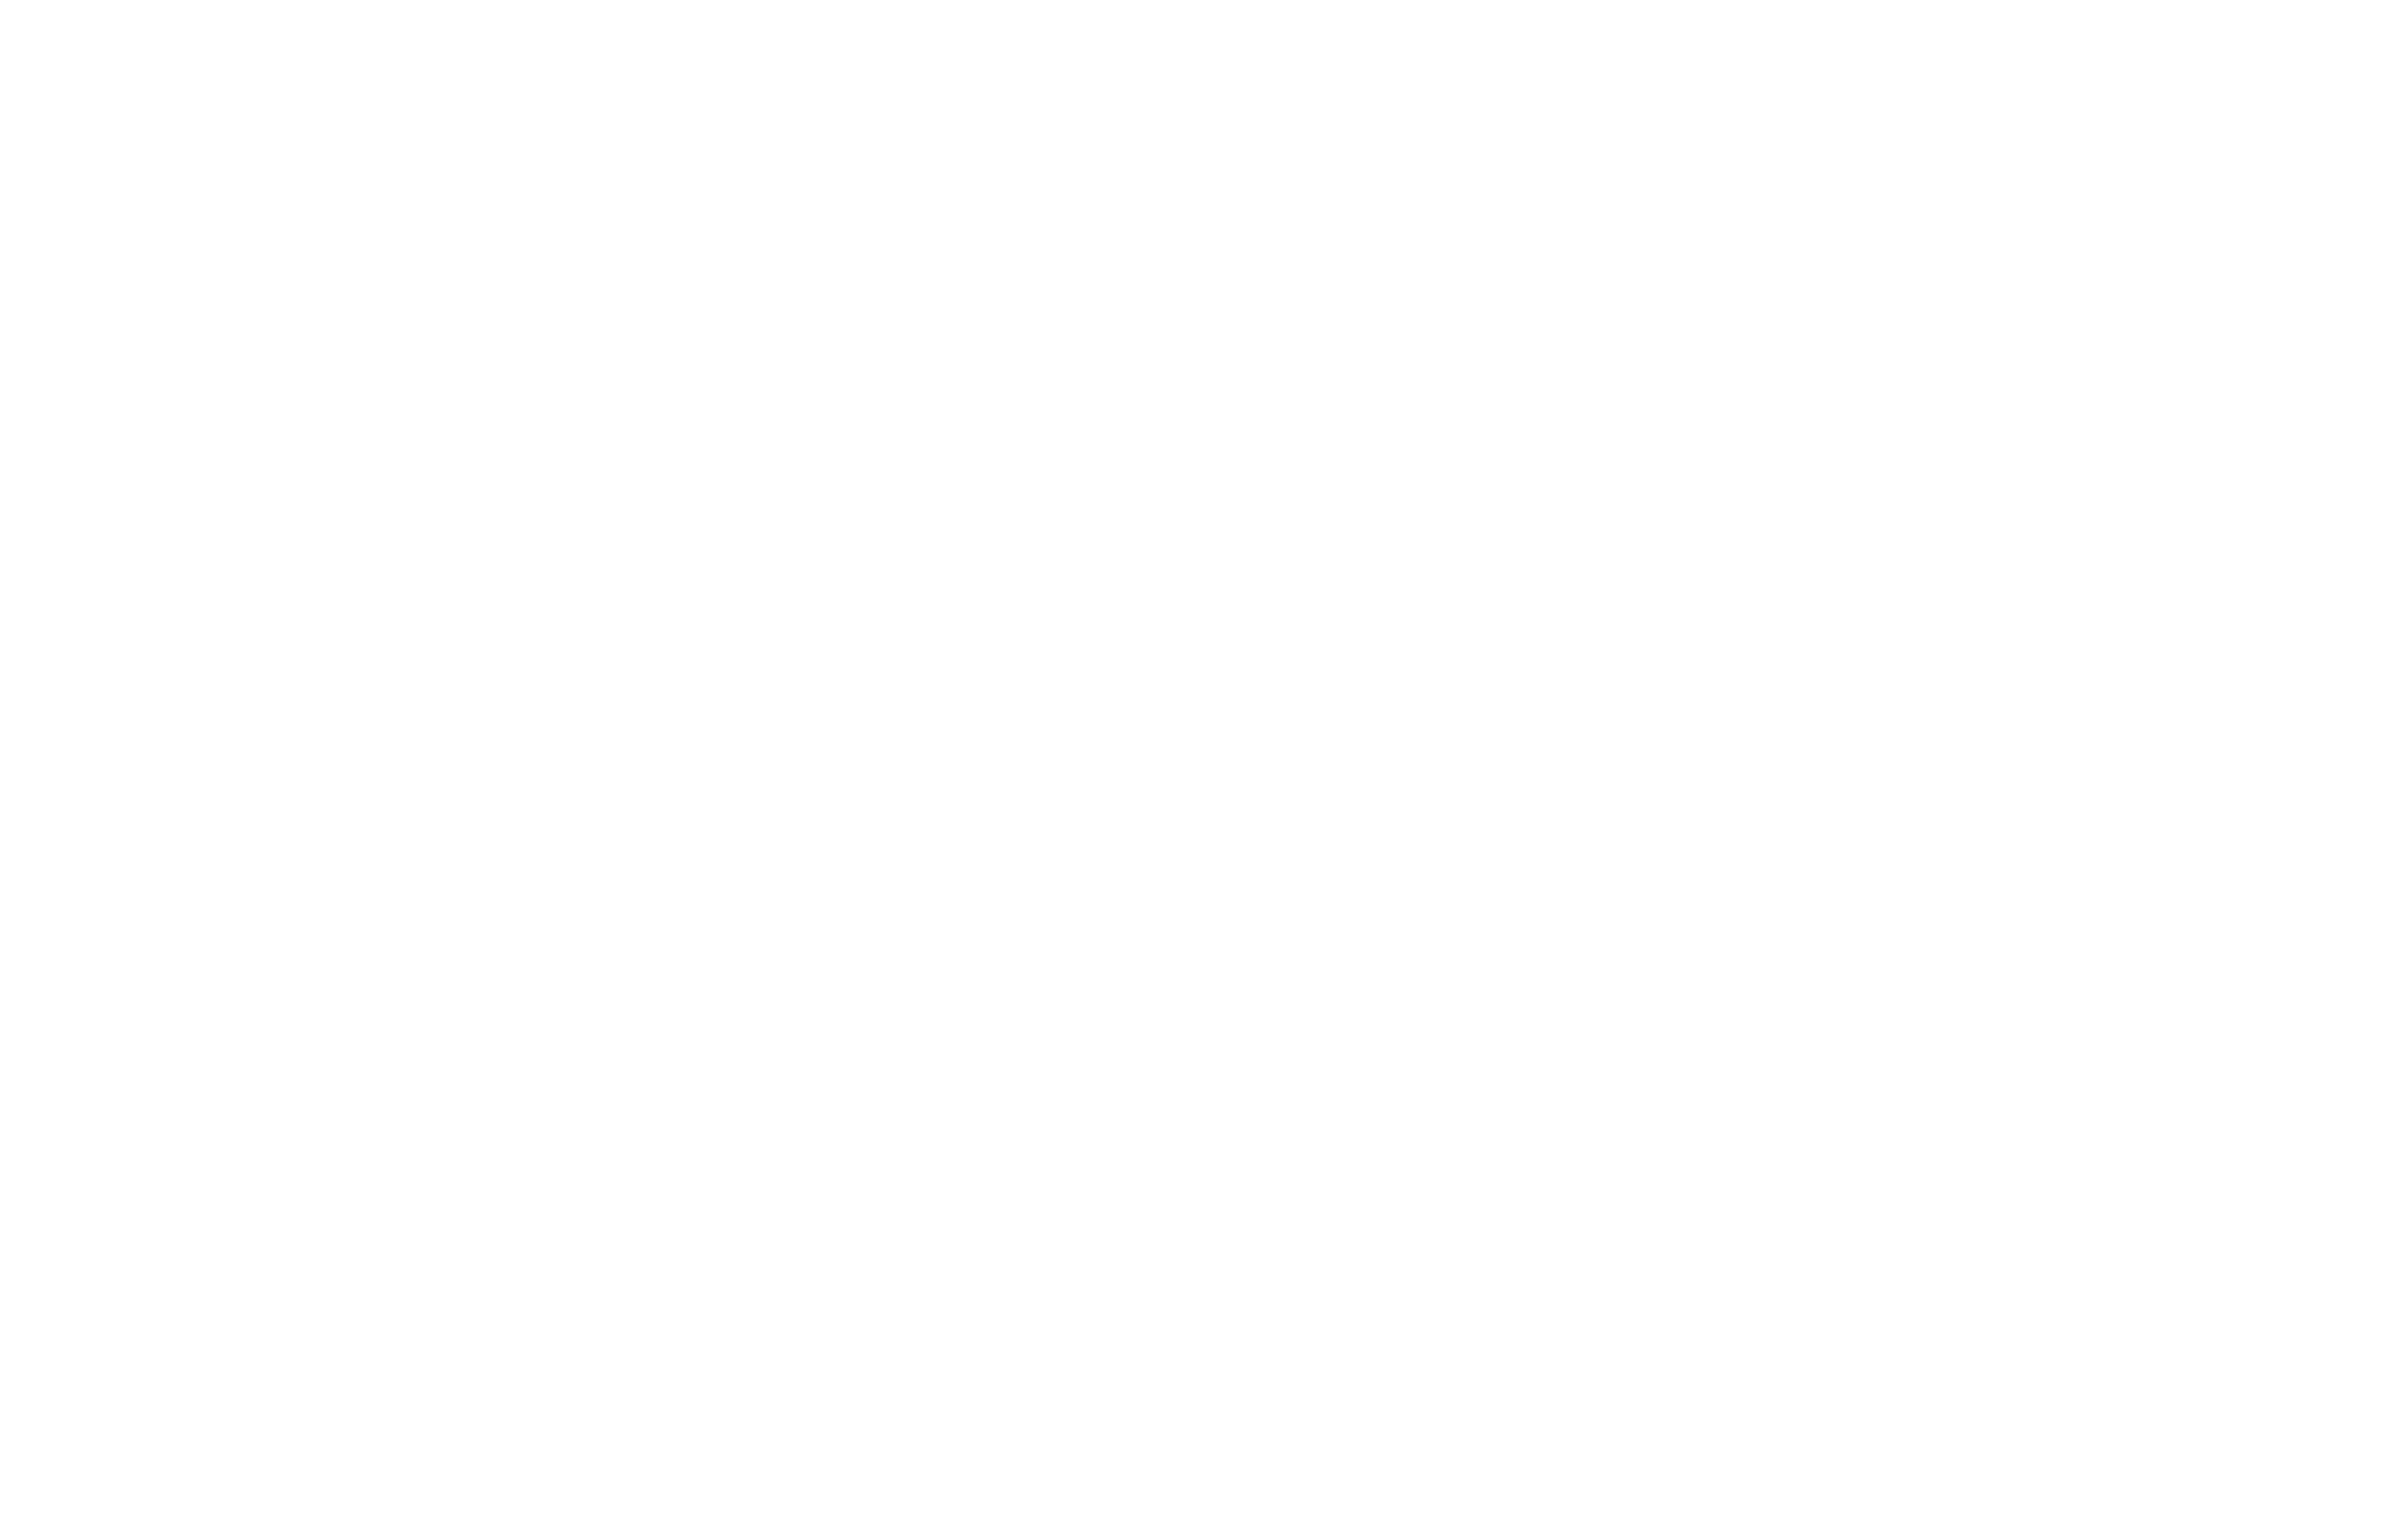 Tradição & Prestígio